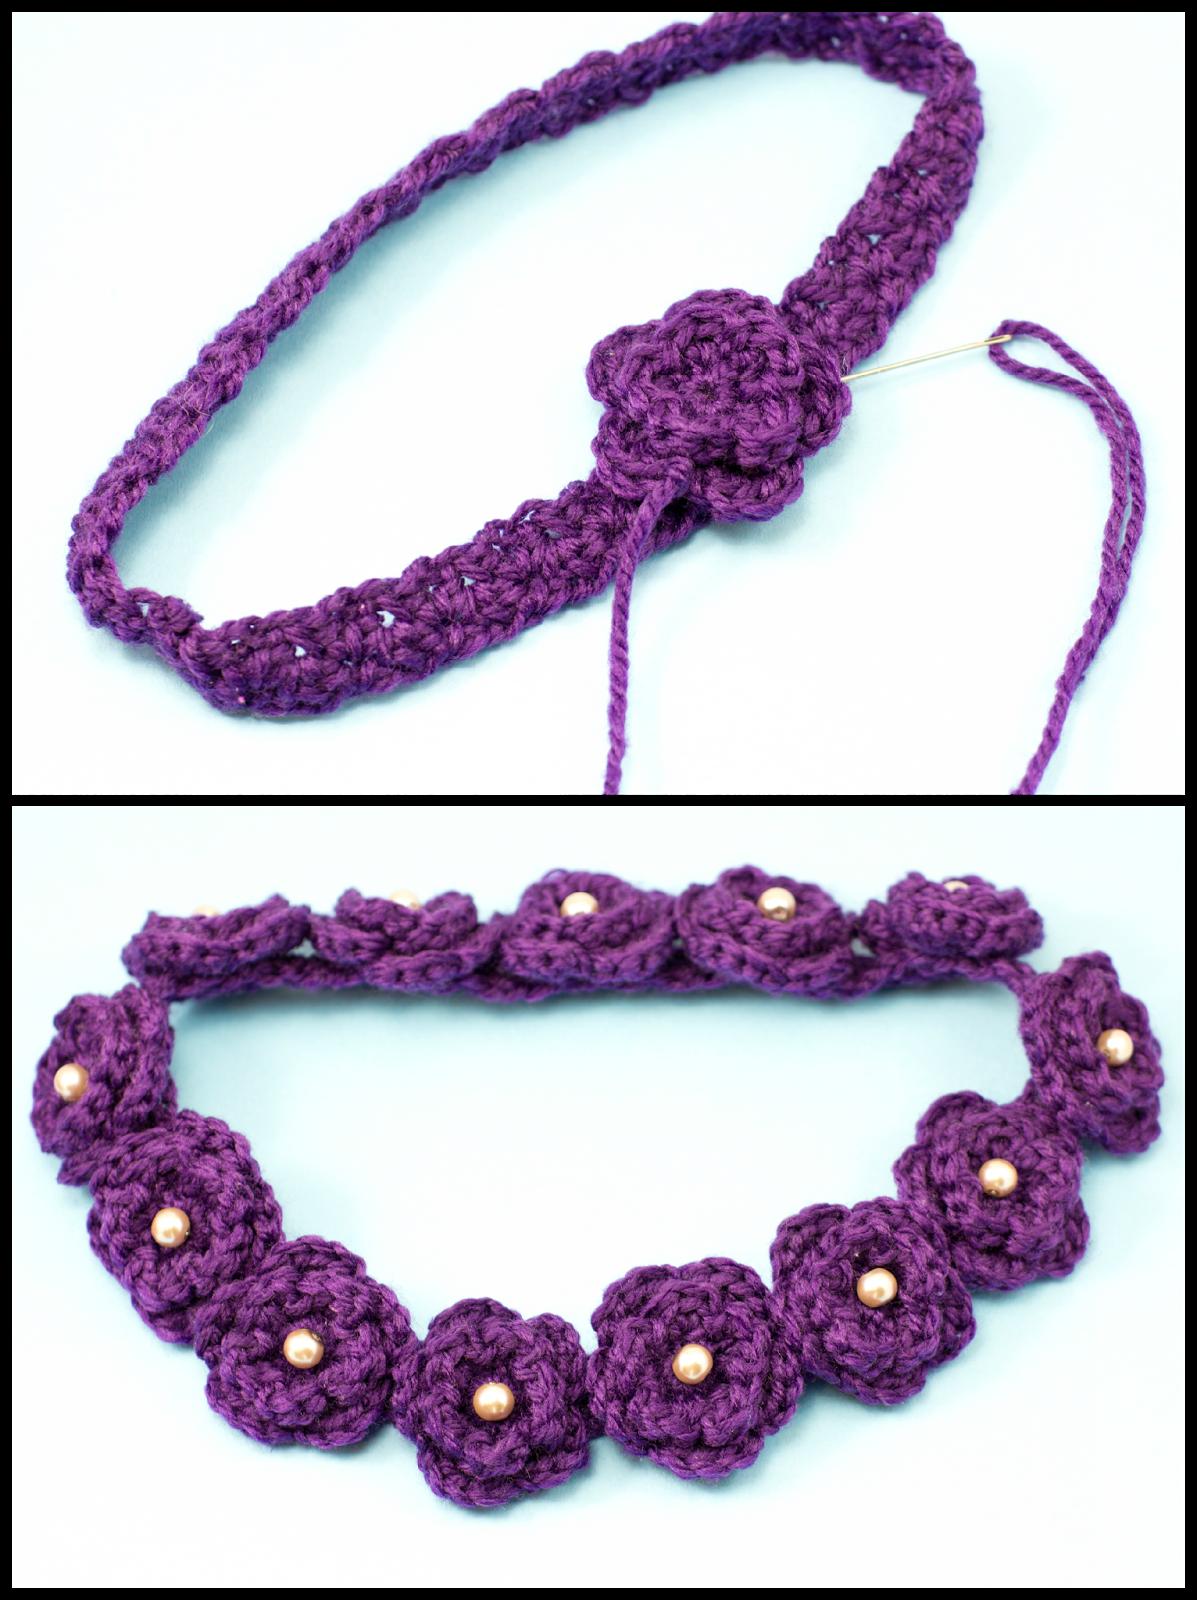 Daisy flower crown crochet pattern hopeful honey flower crowns daisy flower crown crochet pattern izmirmasajfo